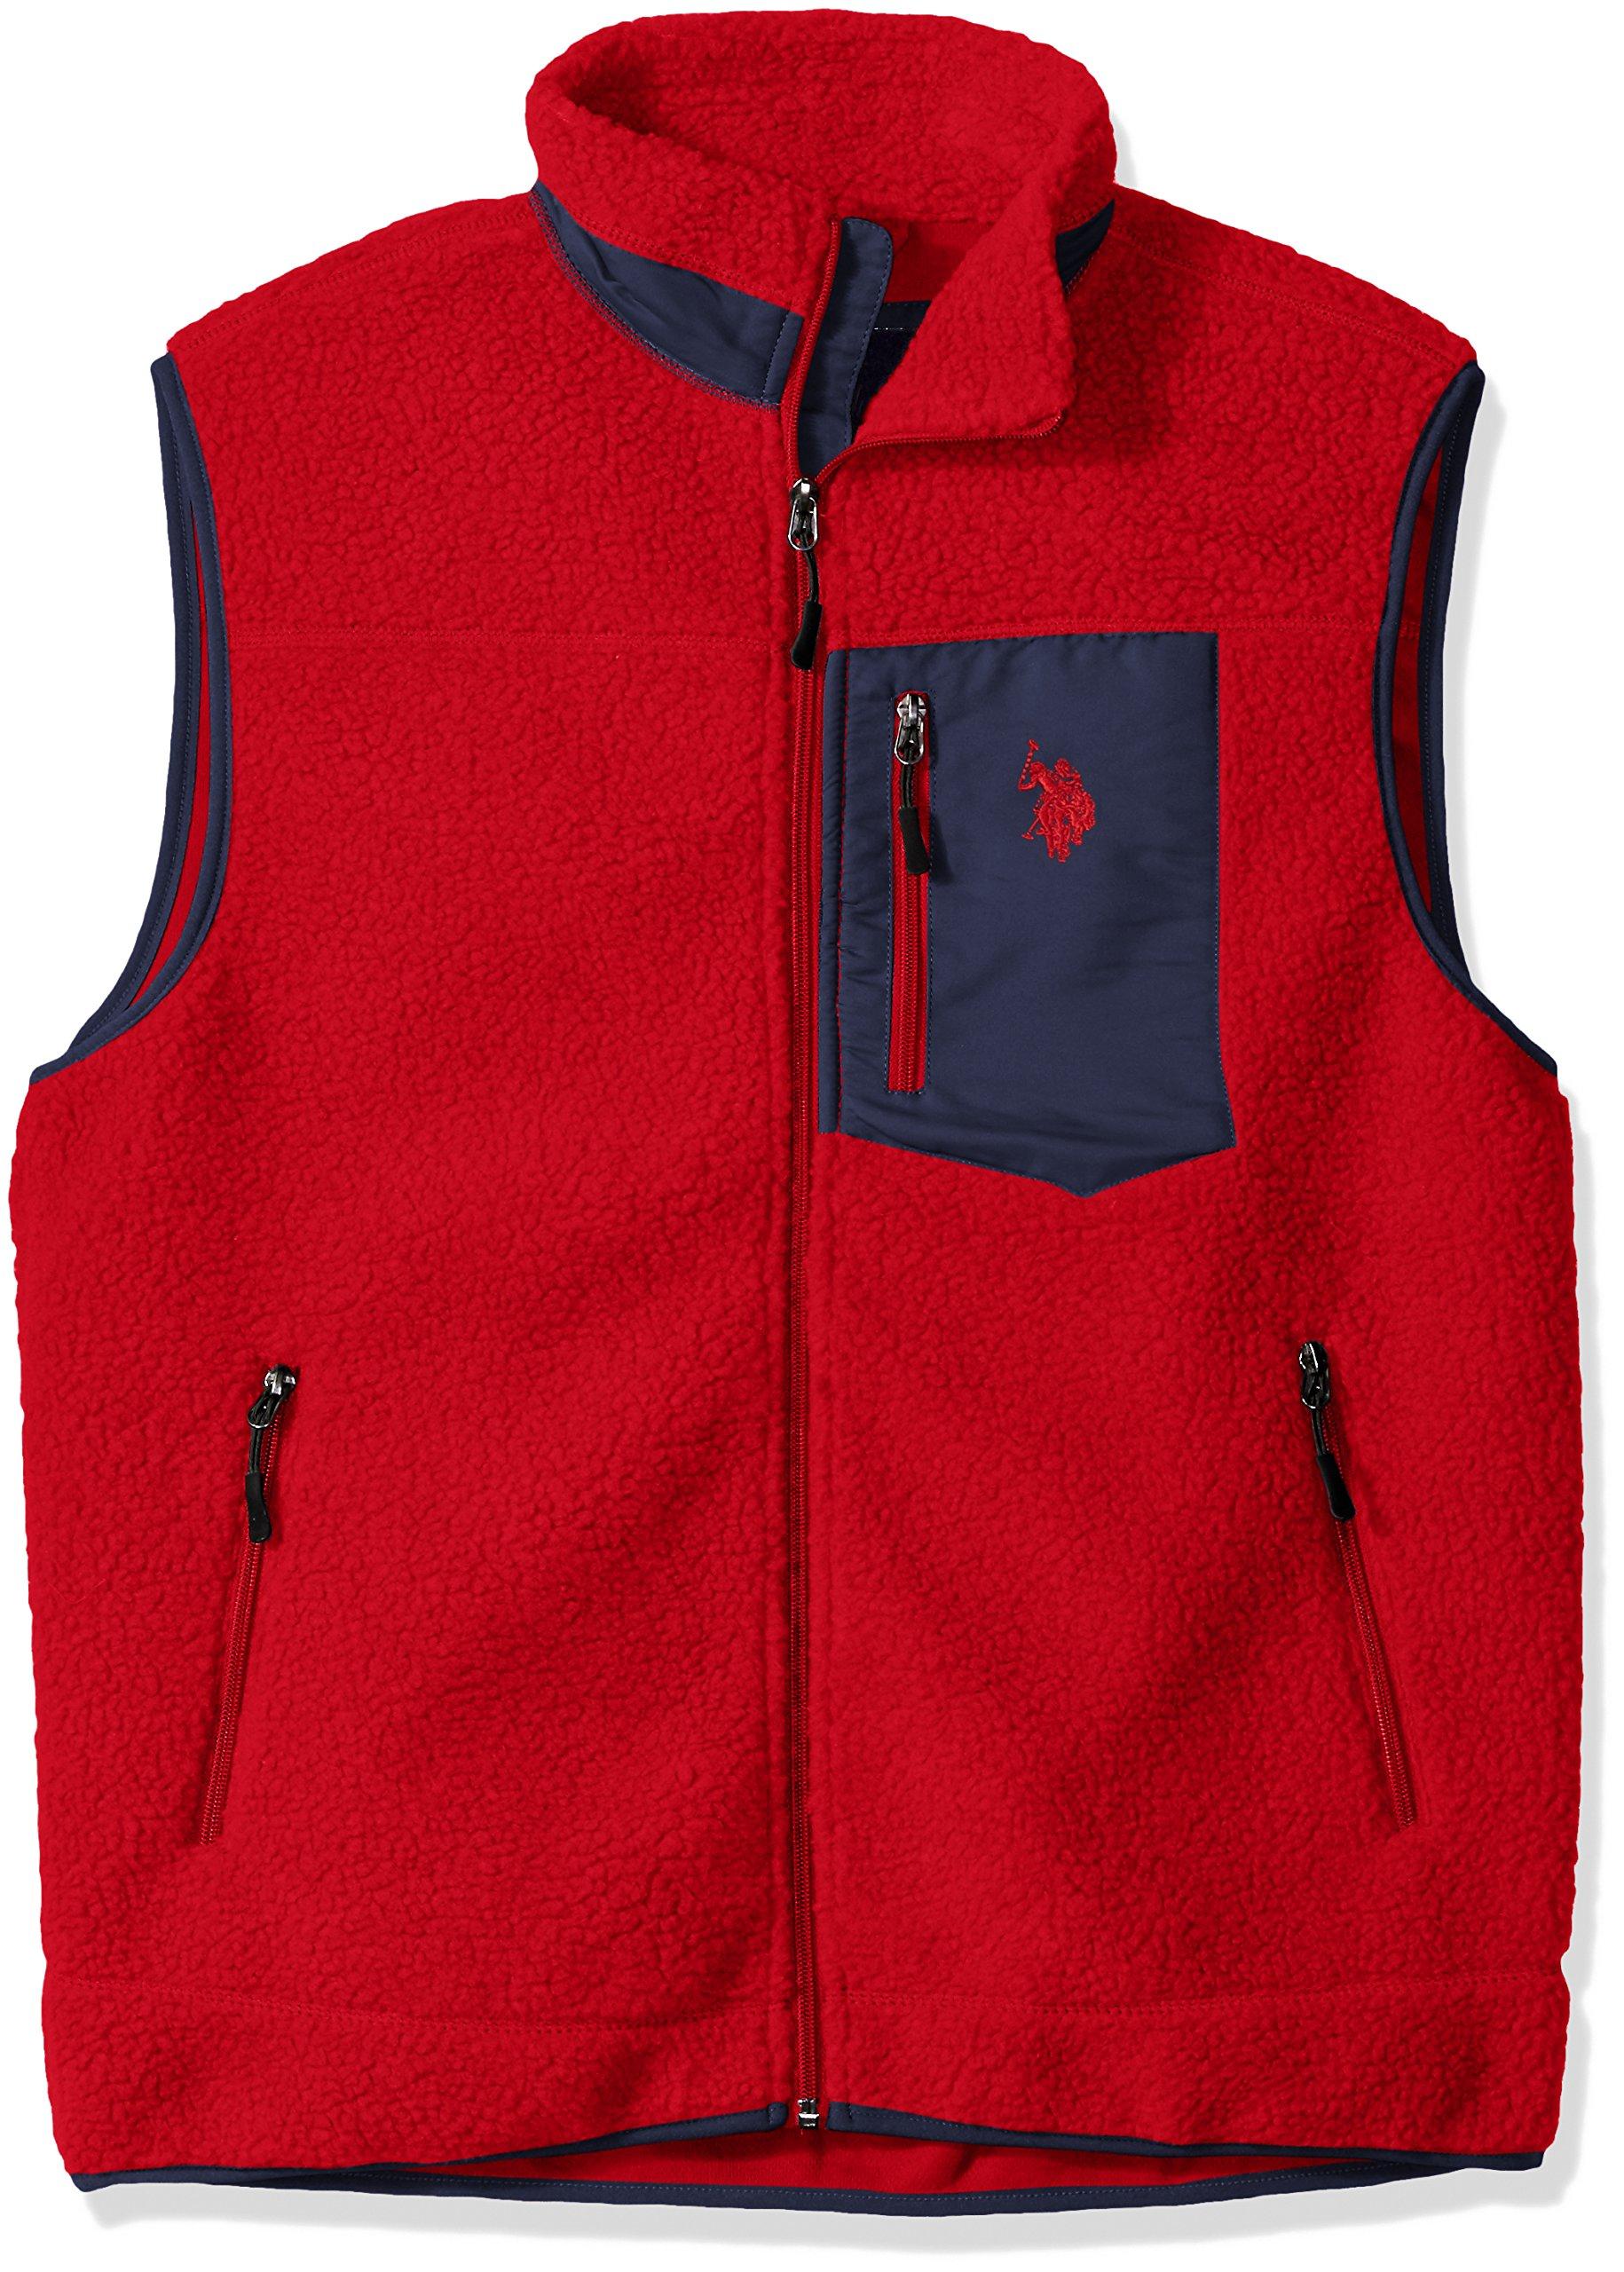 U.S. Polo Assn. Men's Full Zip Sherpa Vest, Engine Red, XL by U.S. Polo Assn.